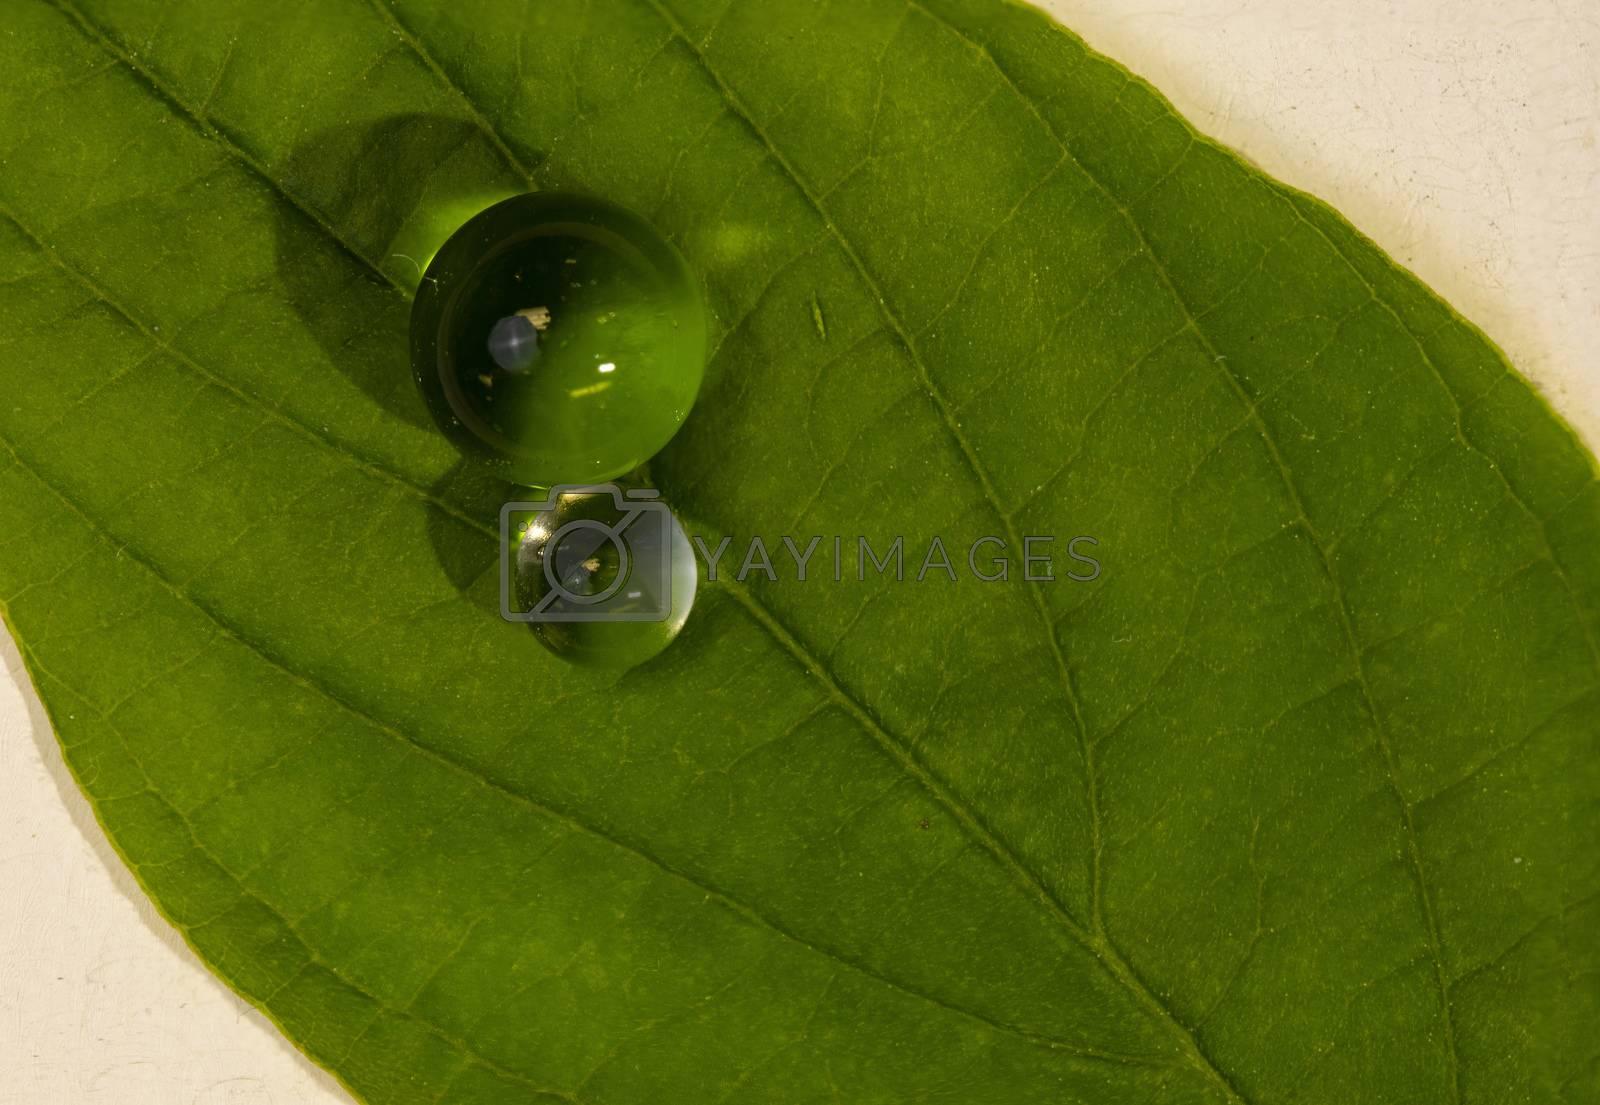 Water Balls on Green Leaf by Charlie Floyd